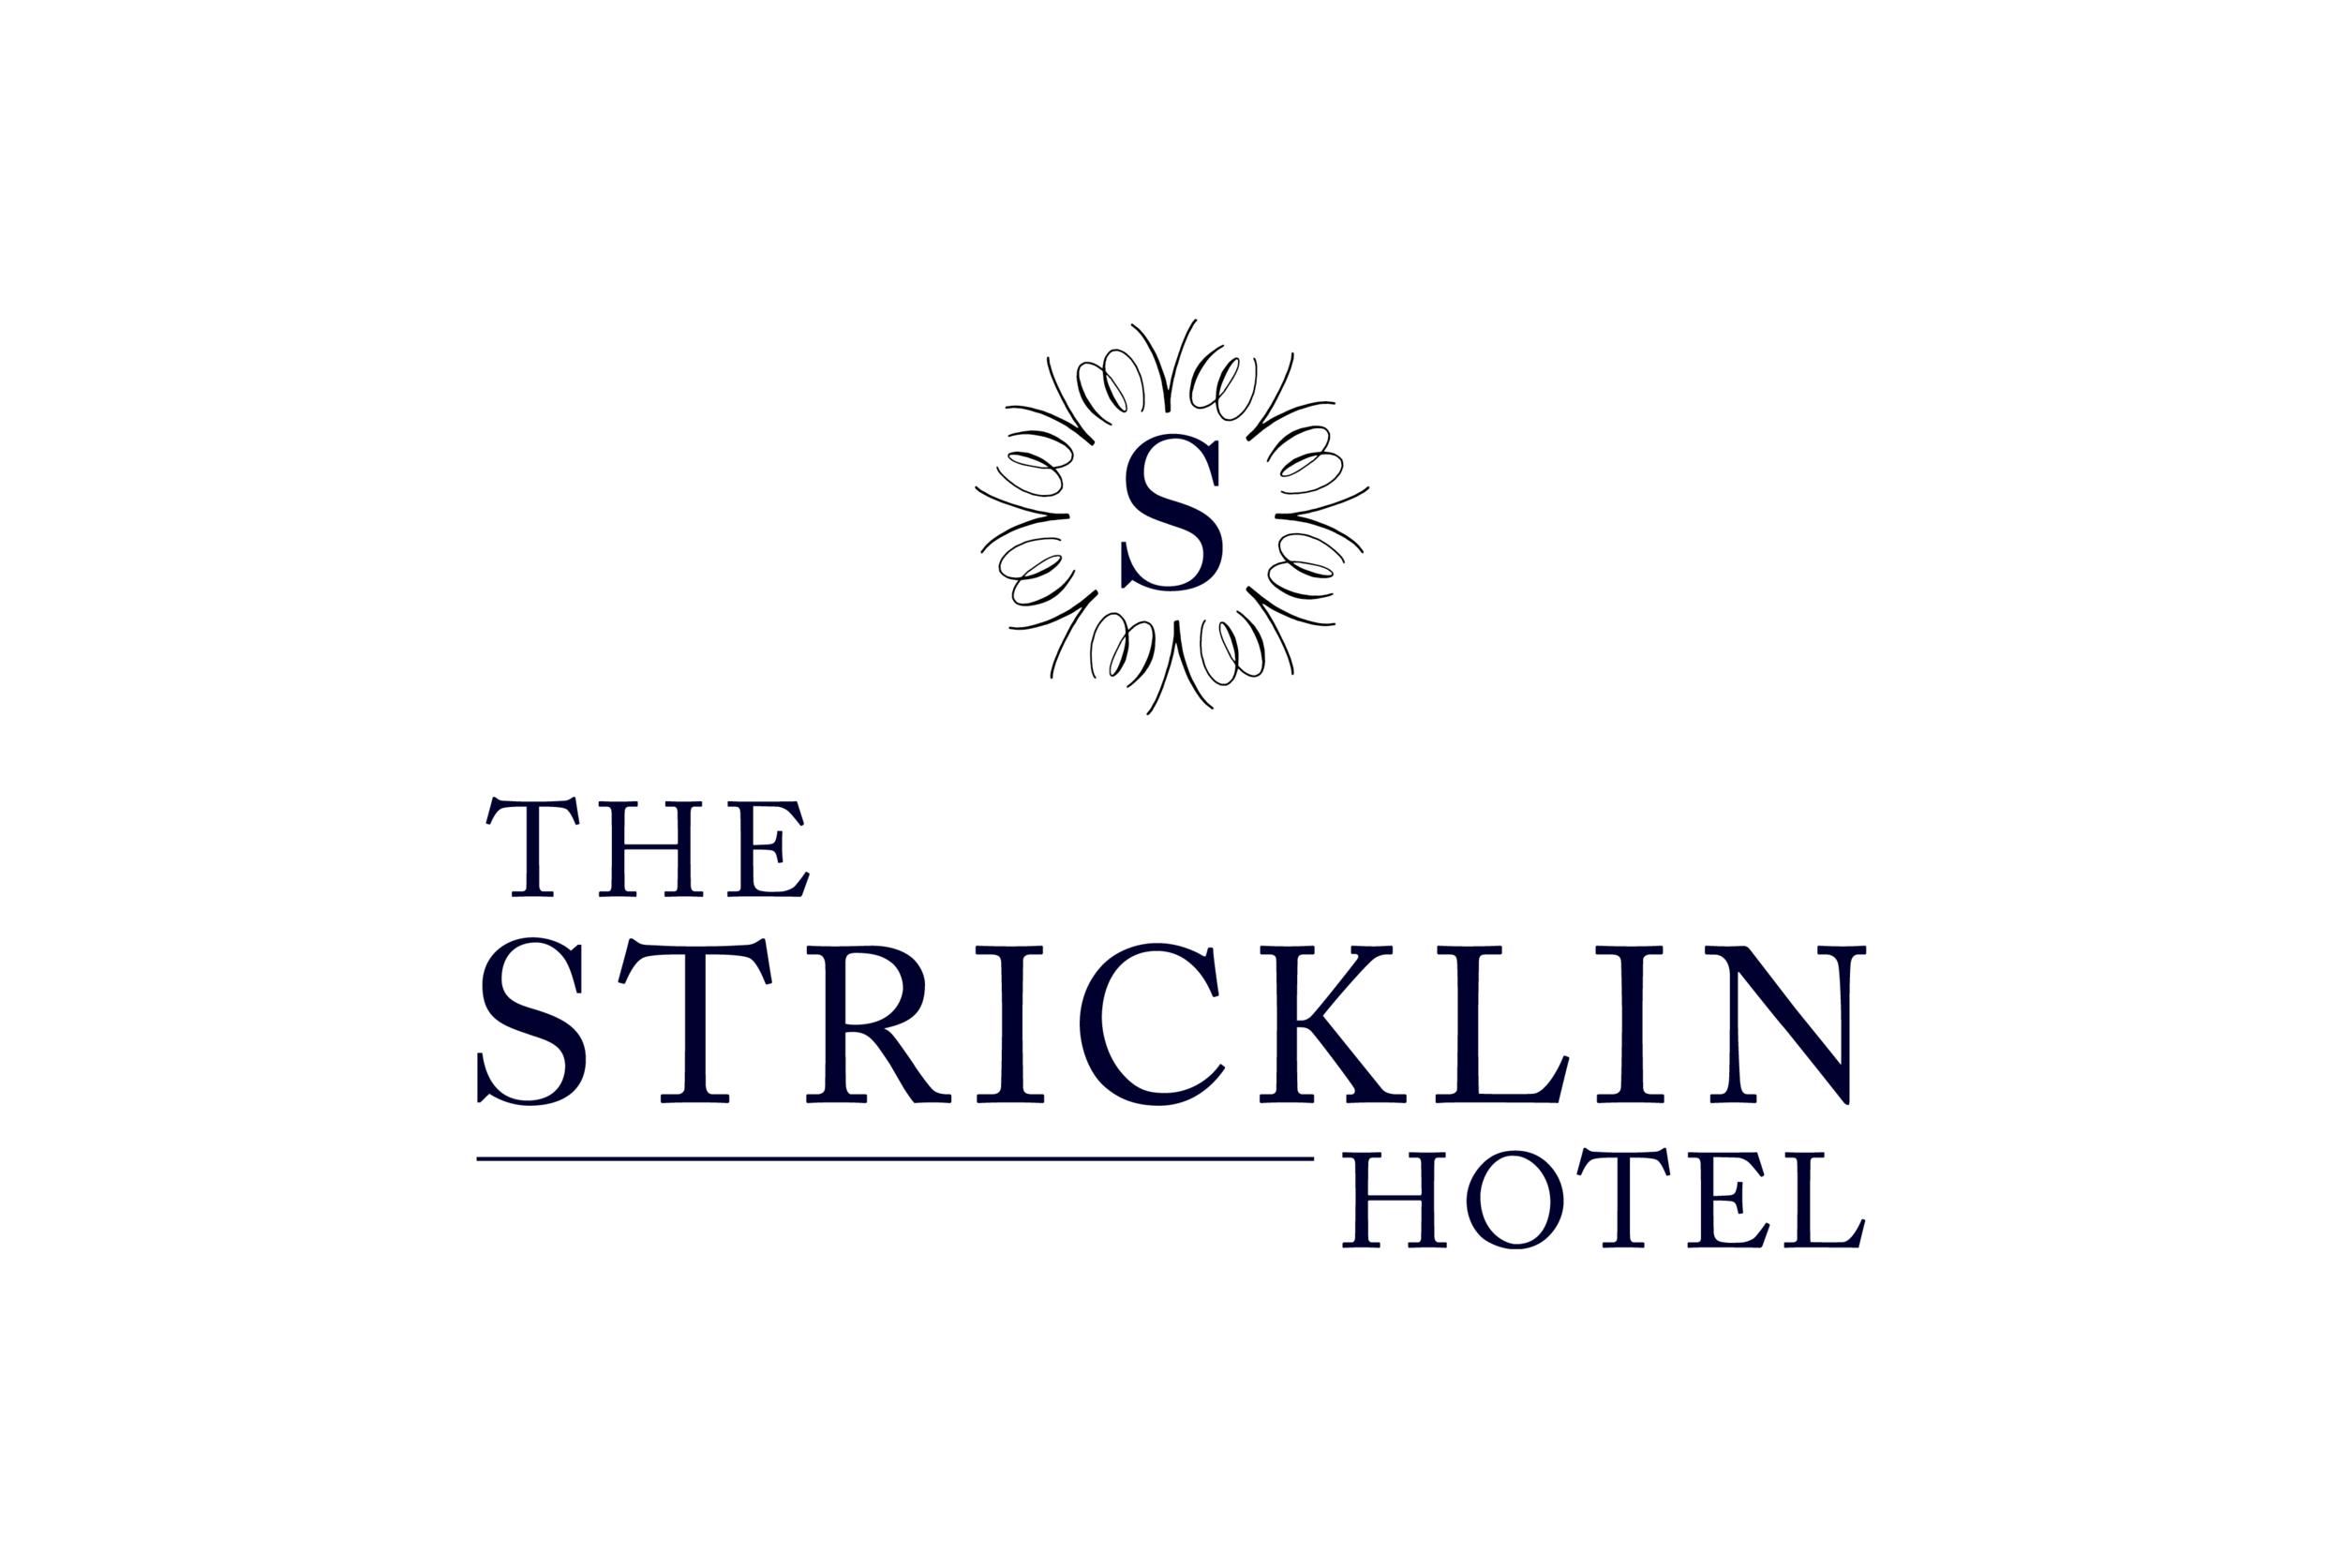 Stricklin_Hotel_logo